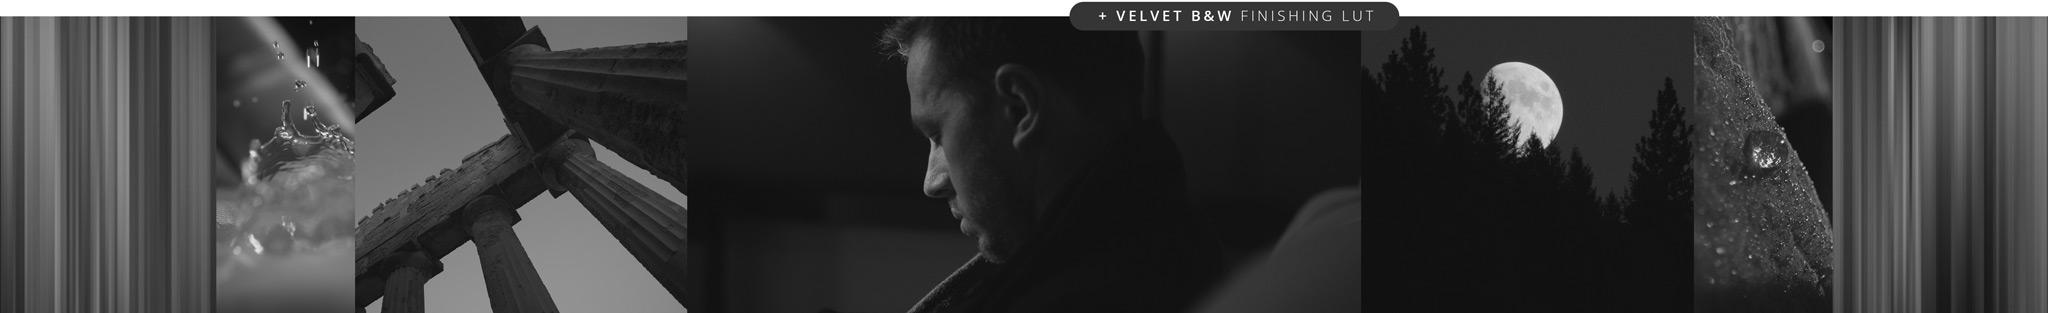 After-VelvetBW